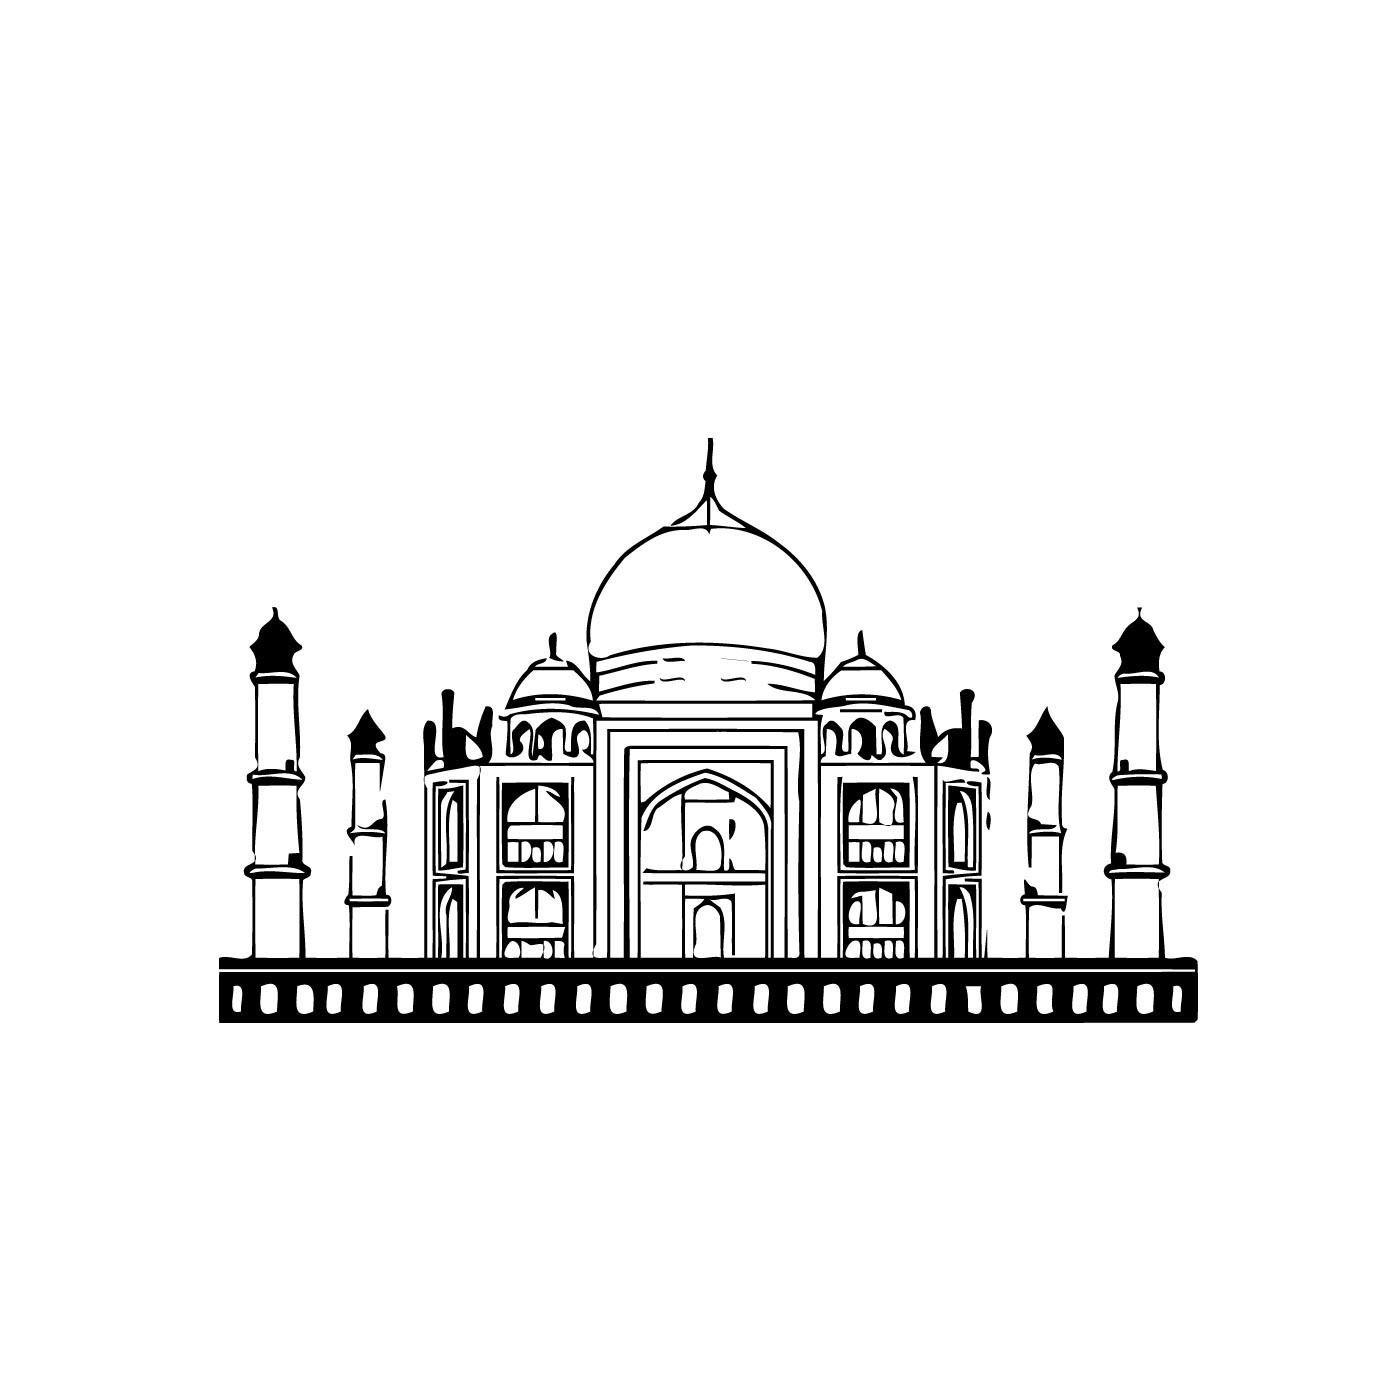 Taj Mahal India Vinyl Wall Decal Sticker Wall Decals And Wall - Custom vinyl wall decals logo   how to remove